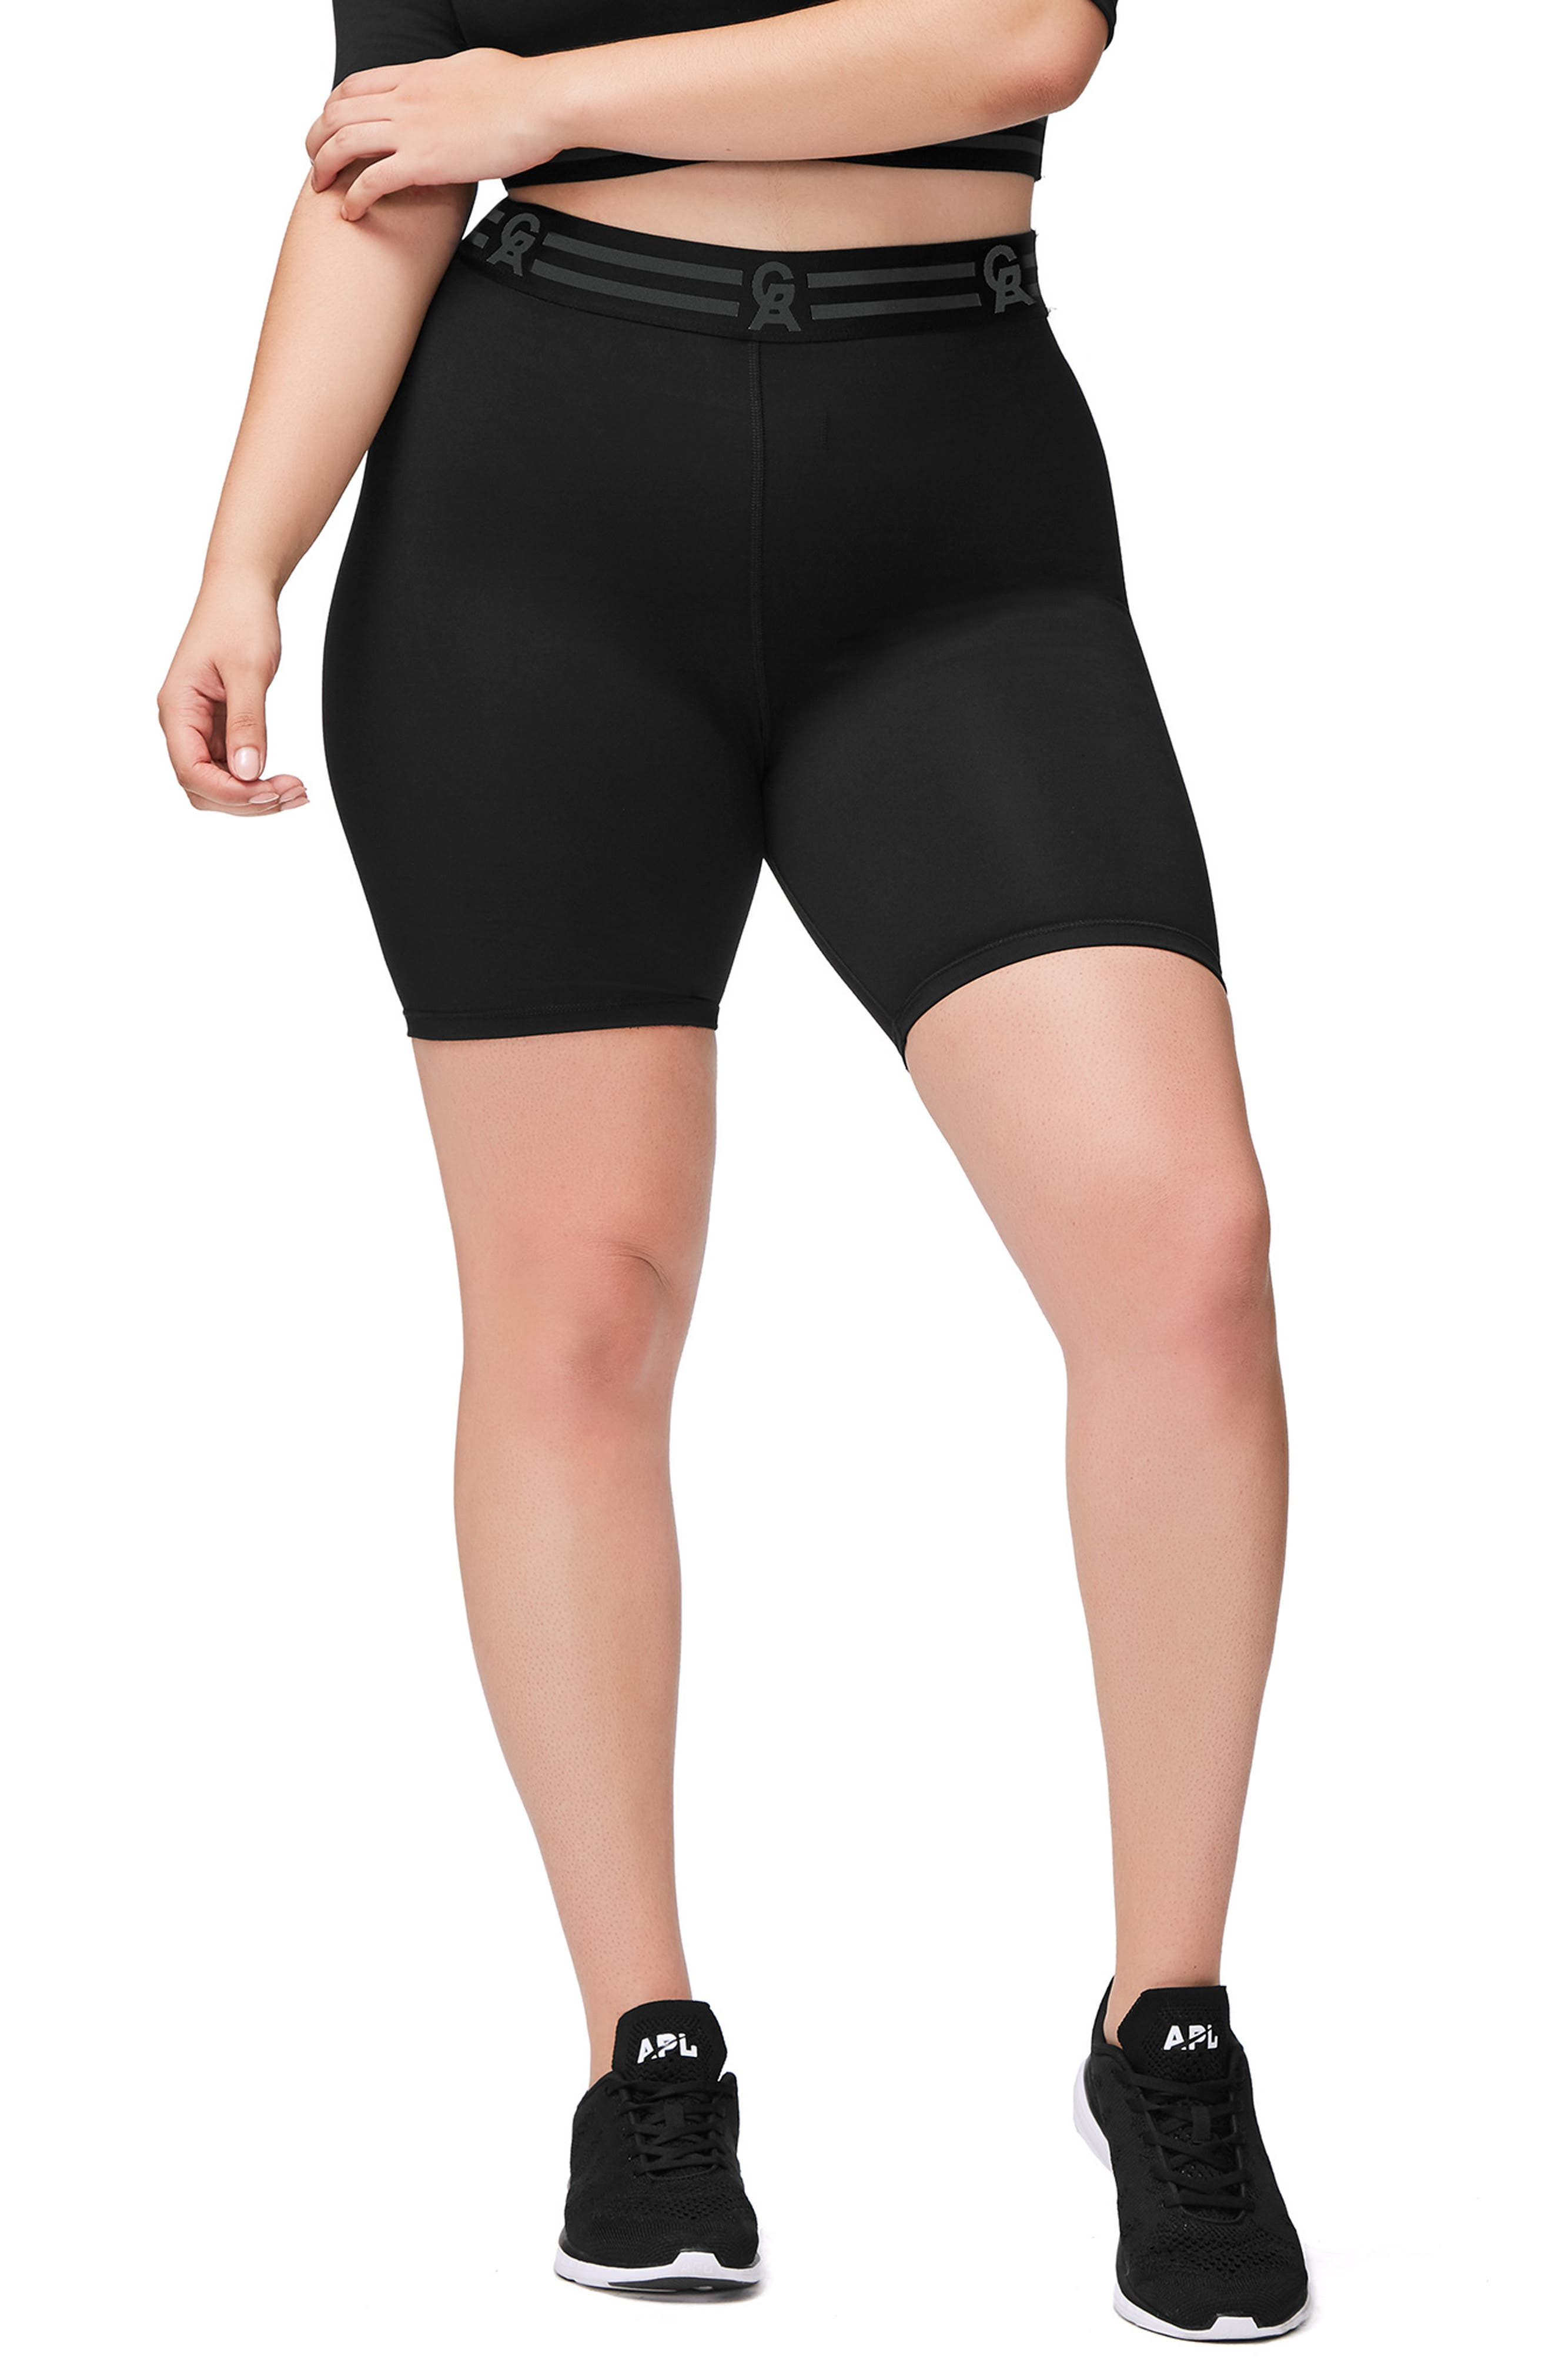 Icon High Waist Biker Shorts,                             Alternate thumbnail 2, color,                             BLACK001